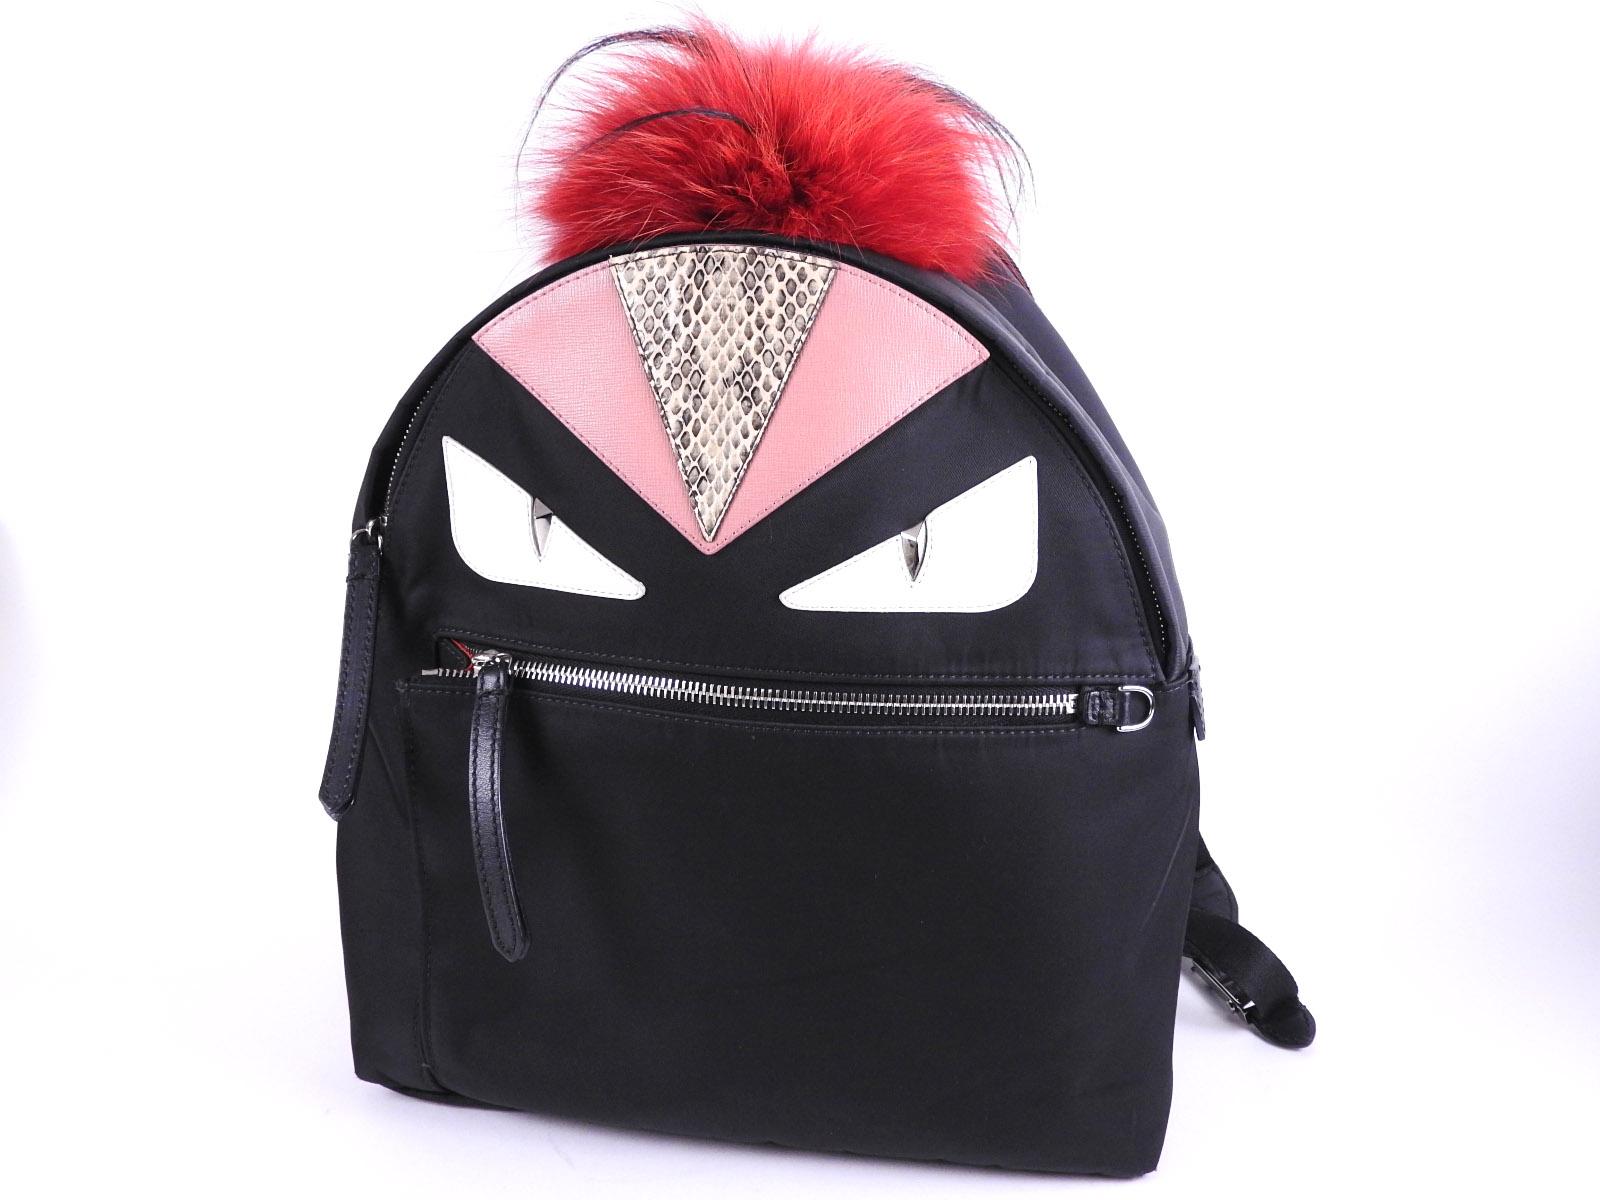 add5176101ec Auth FENDI Bugs Monster Eye Backpack Bag Nylon Leather Fur Black Red 8BZ035  A-8604